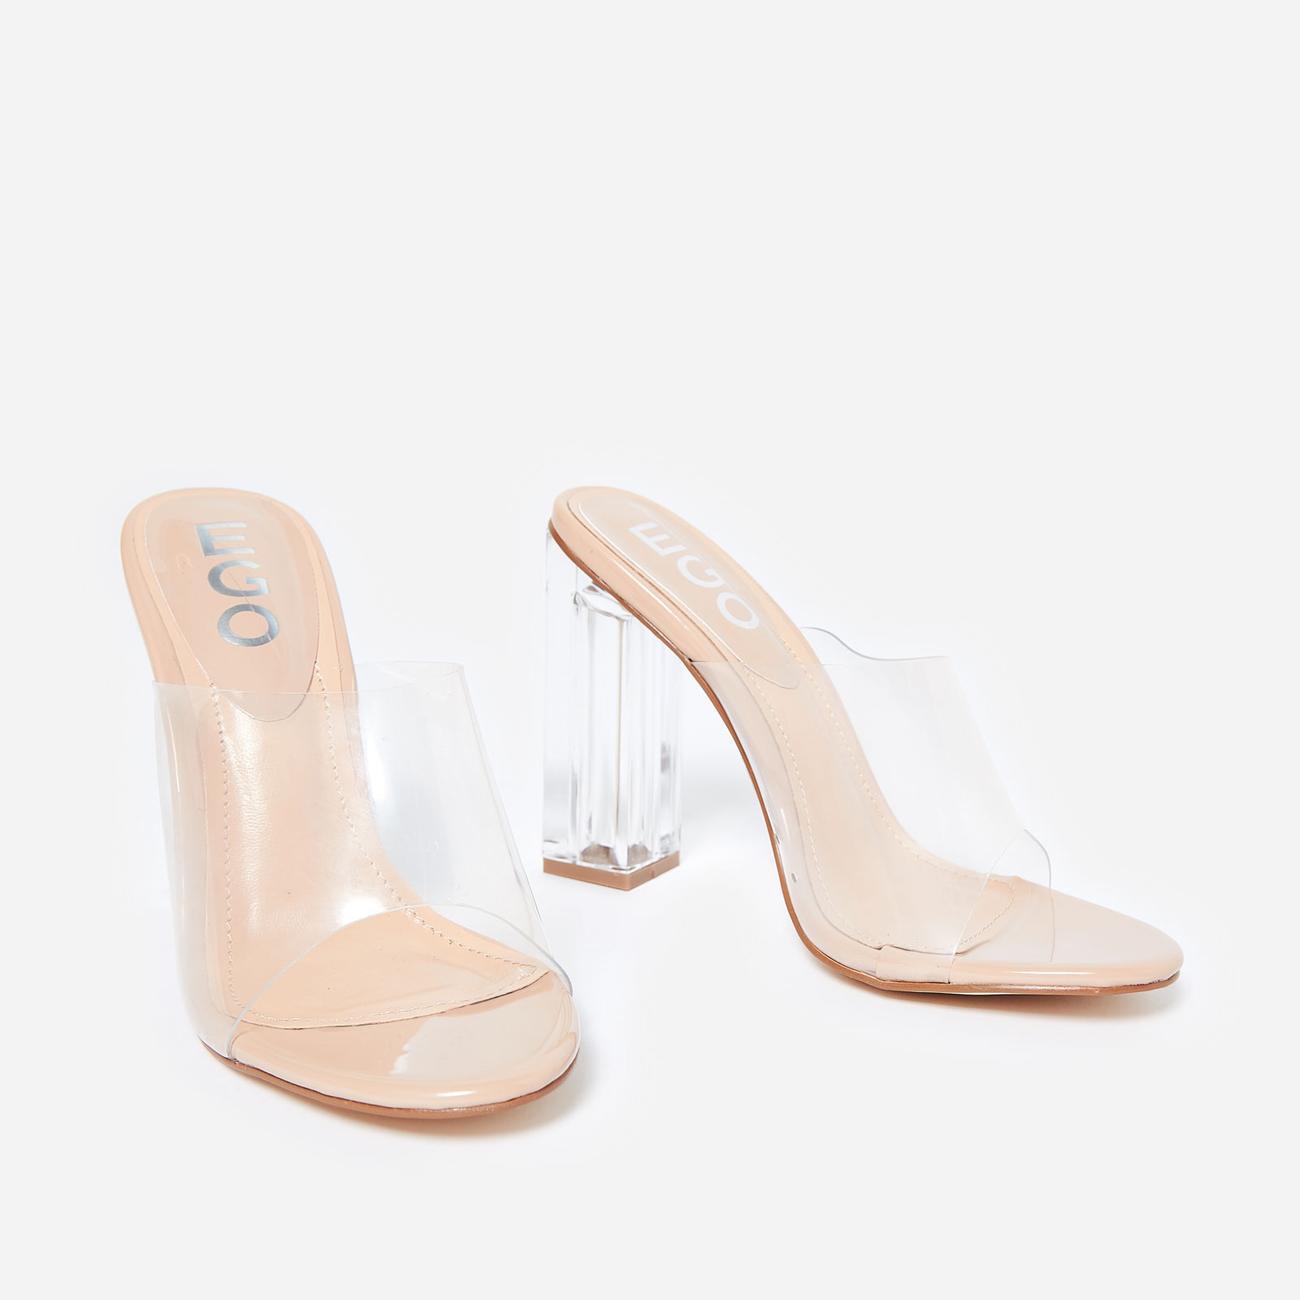 Fusion Peep Toe Perspex Block Clear Heel Mule In Nude Patent Image 3